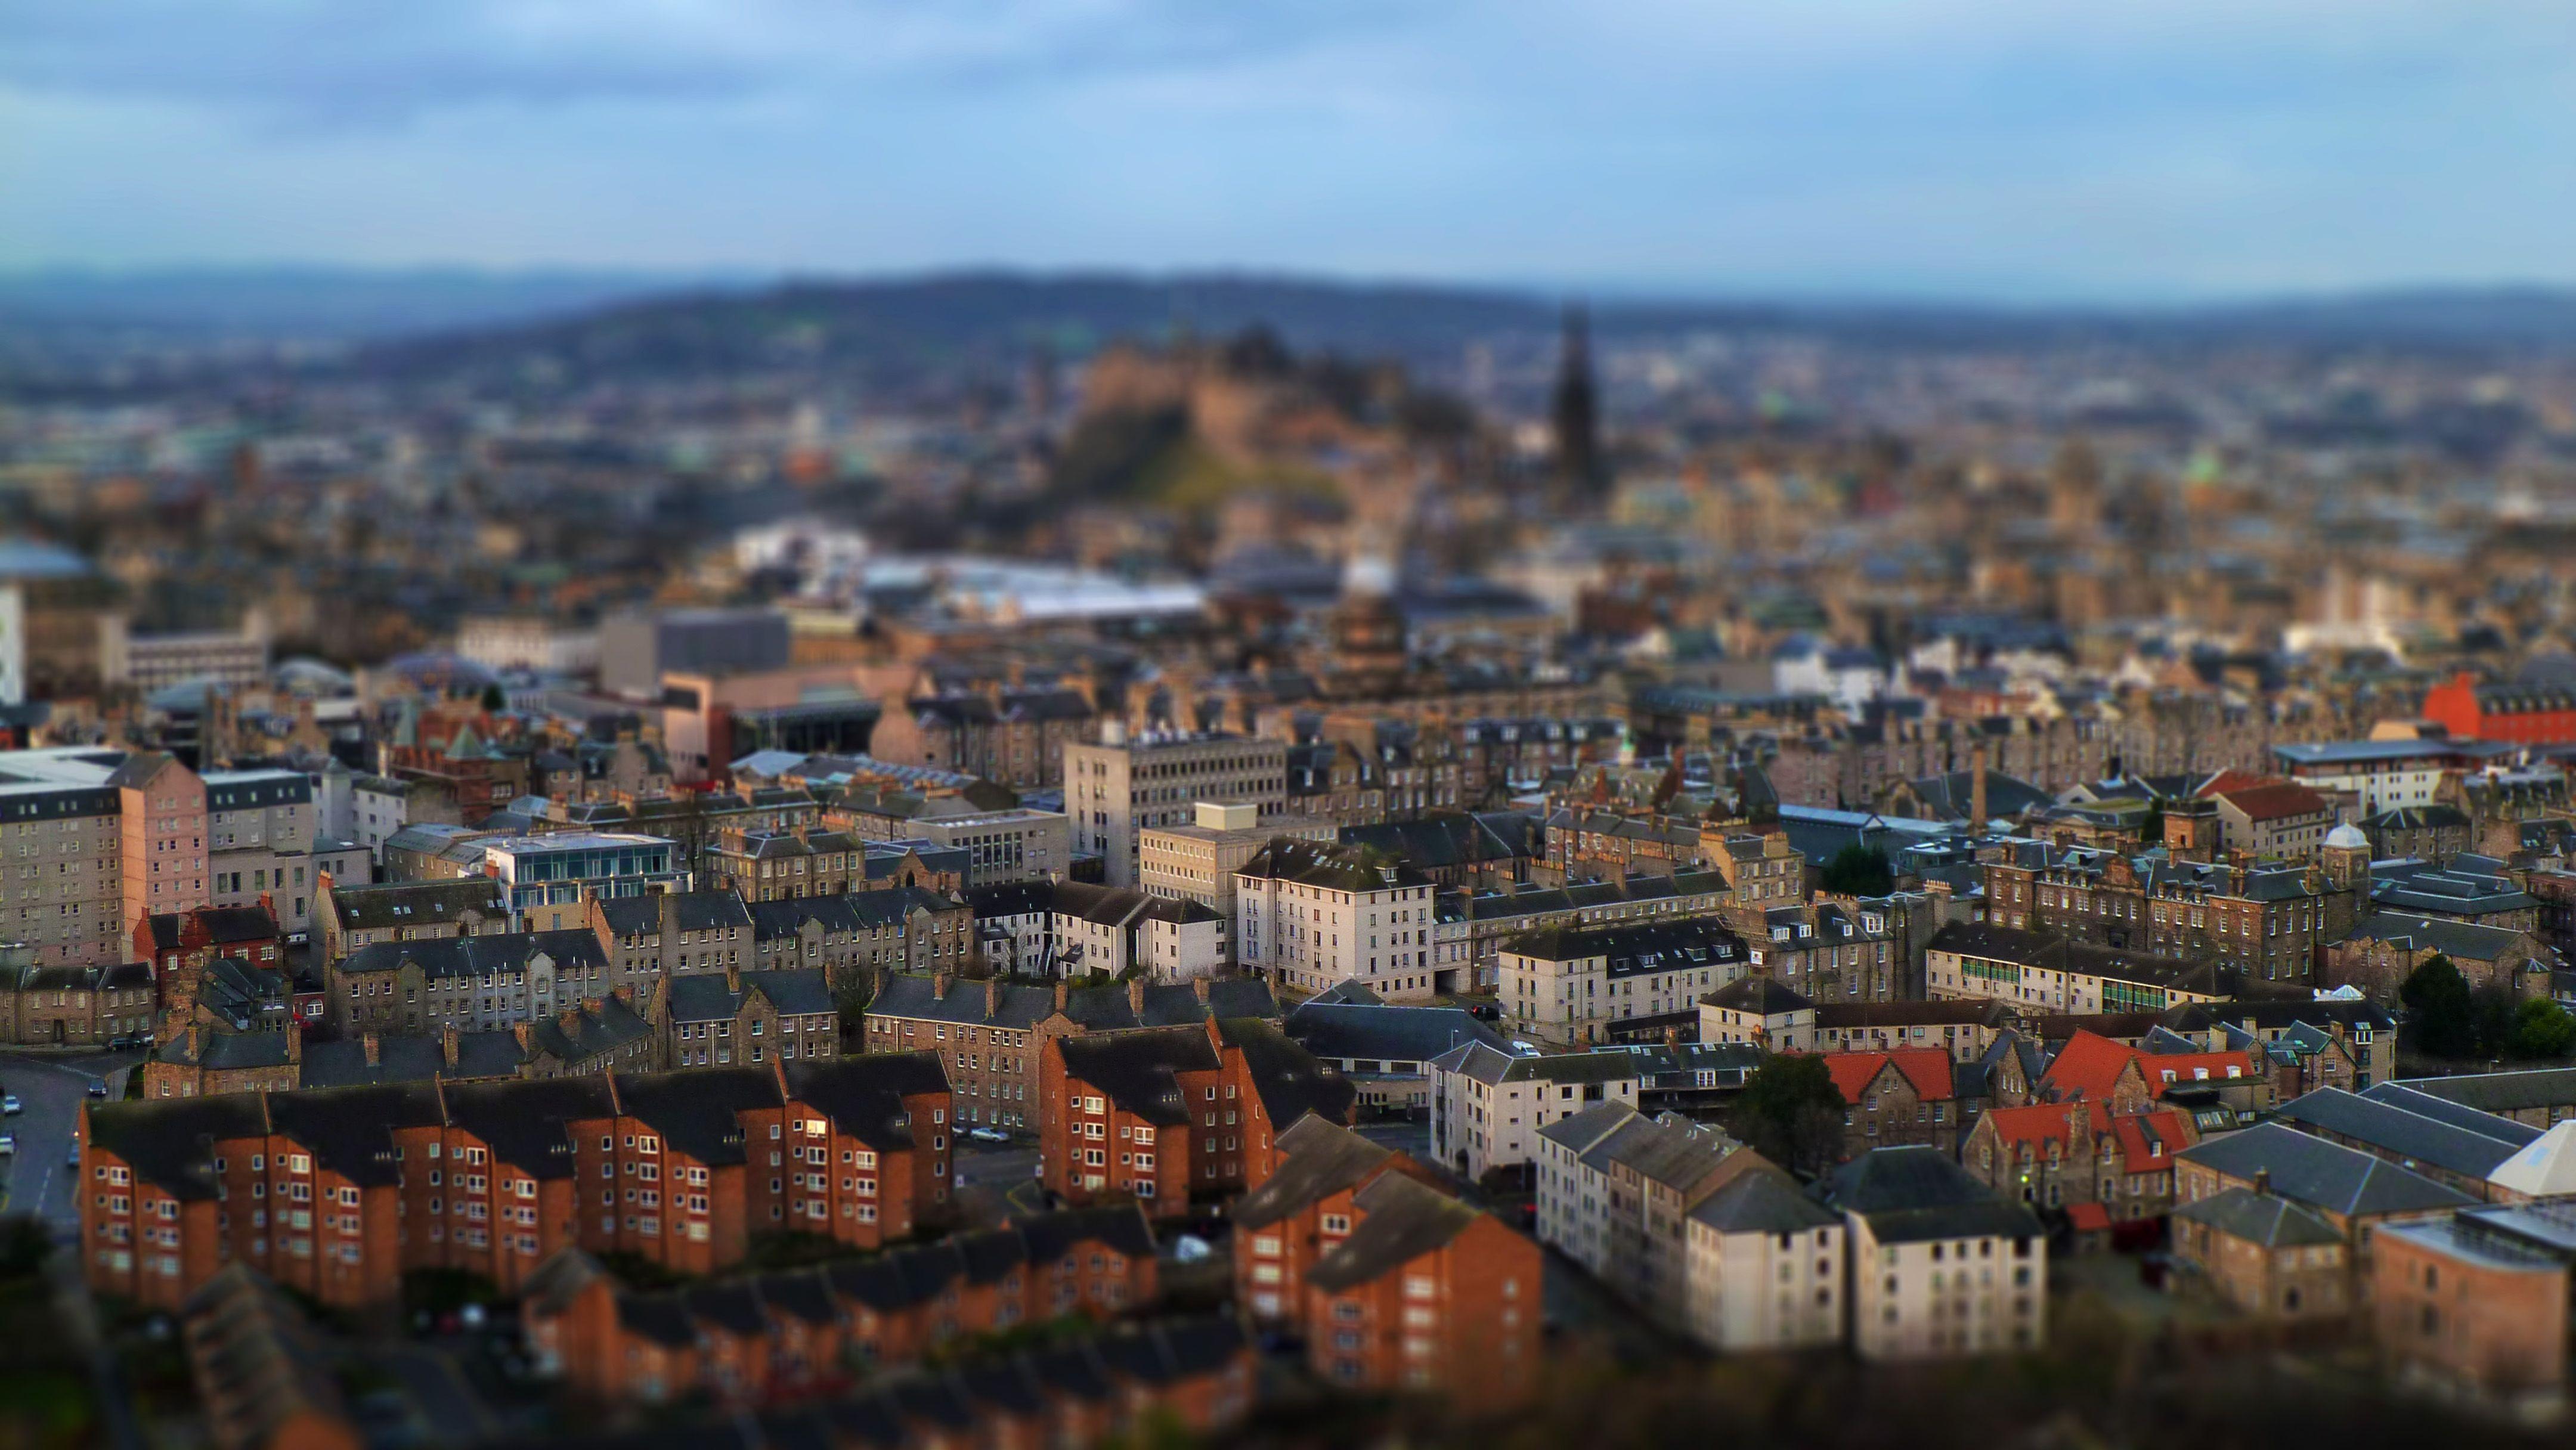 Probando el efecto Tilt Shift sobre una vista de Edinburgh (09/12/2011)